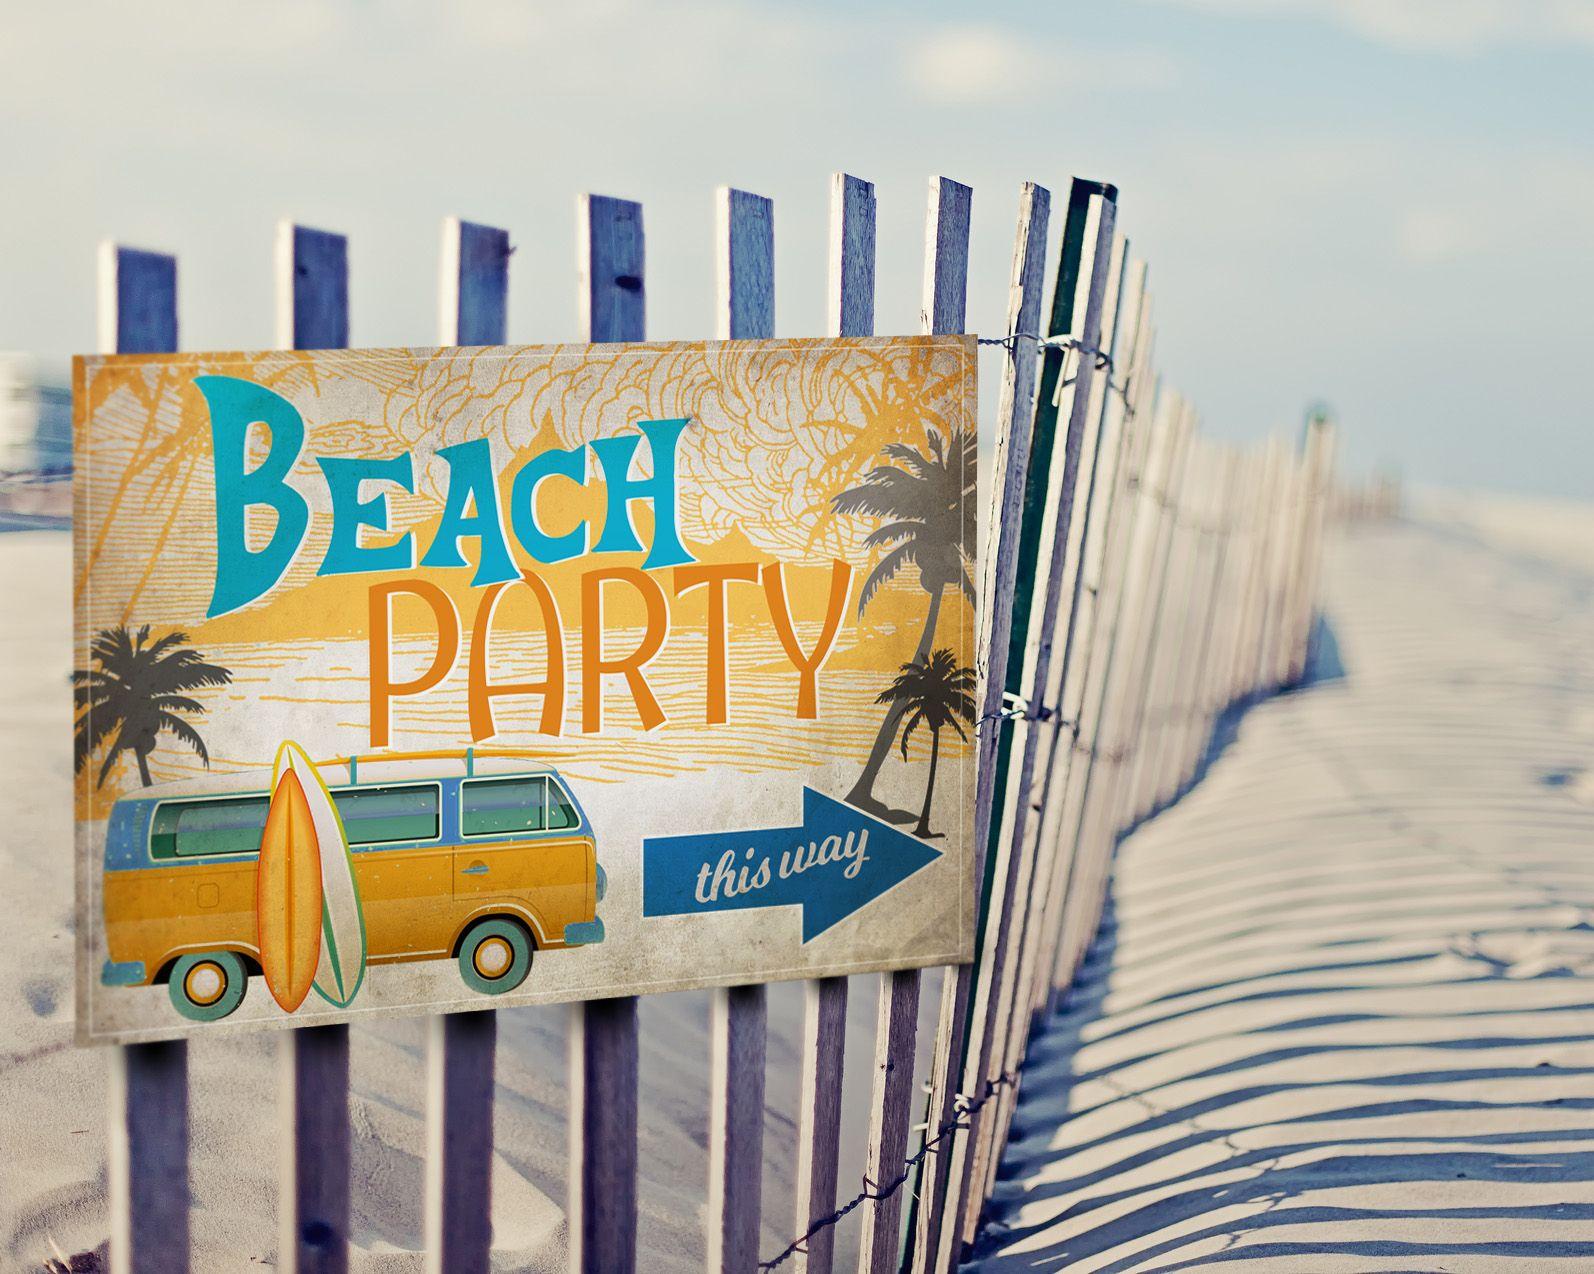 Vintage Surf Party Posters graphic design Pinterest